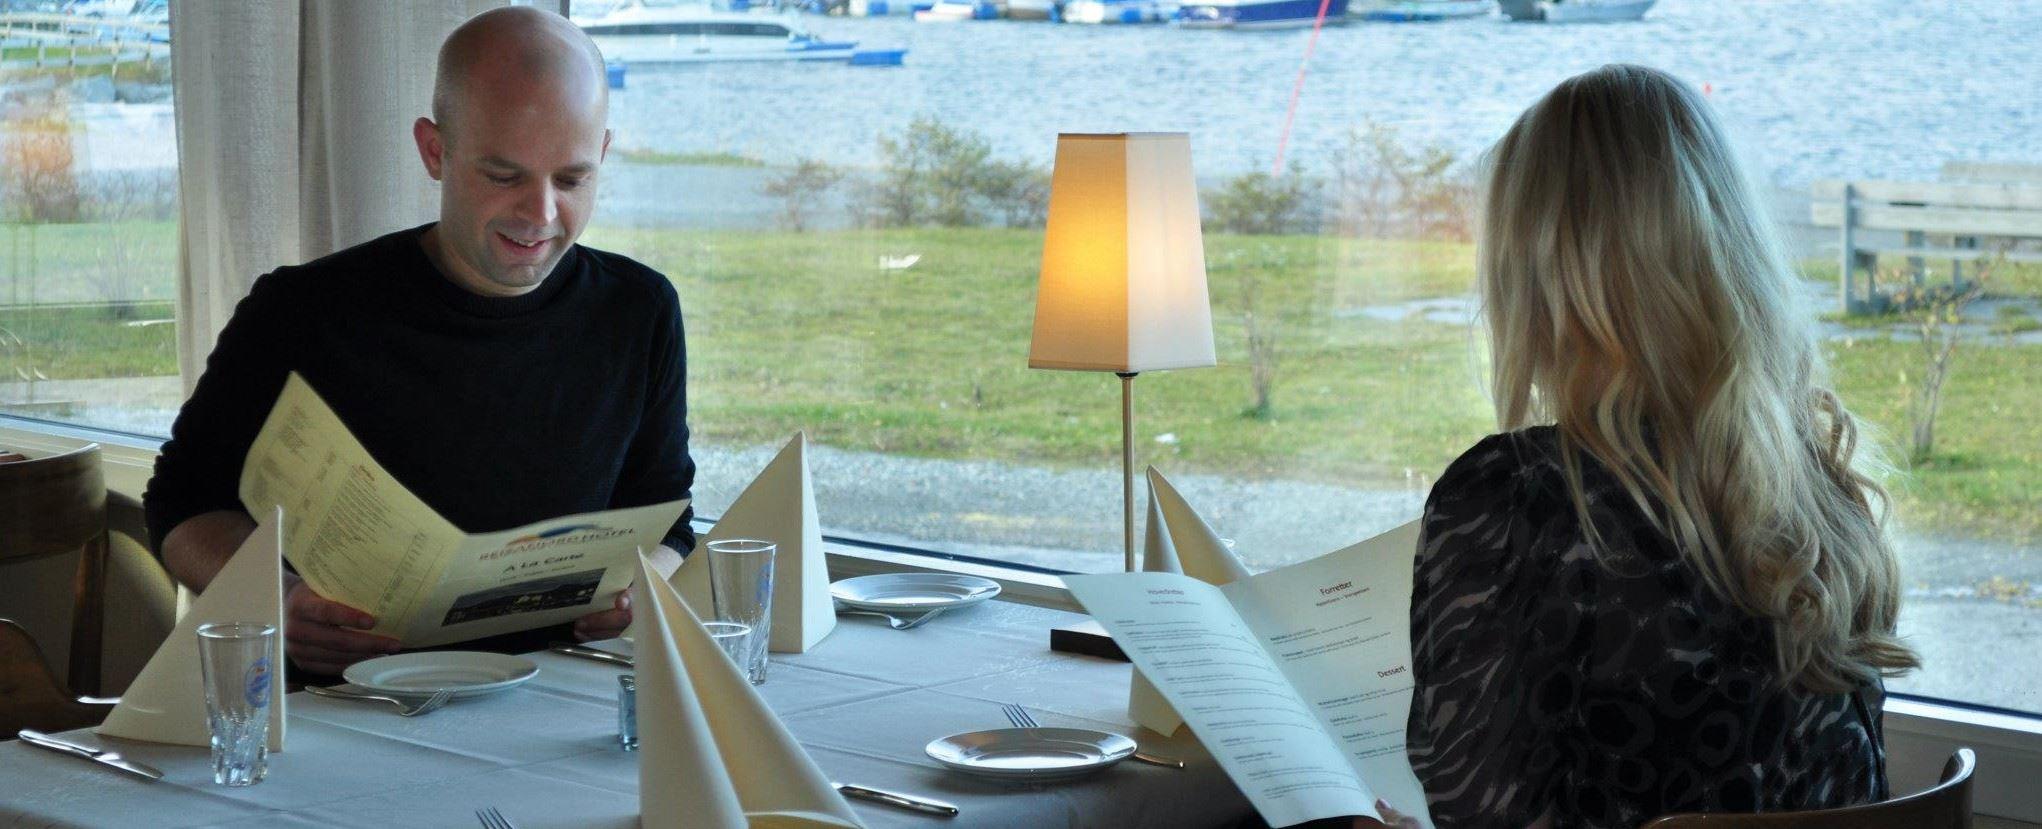 Walsafari in Skjervøy und im Reisafjord inklusive Übernachtung im Reisafjord Hotel